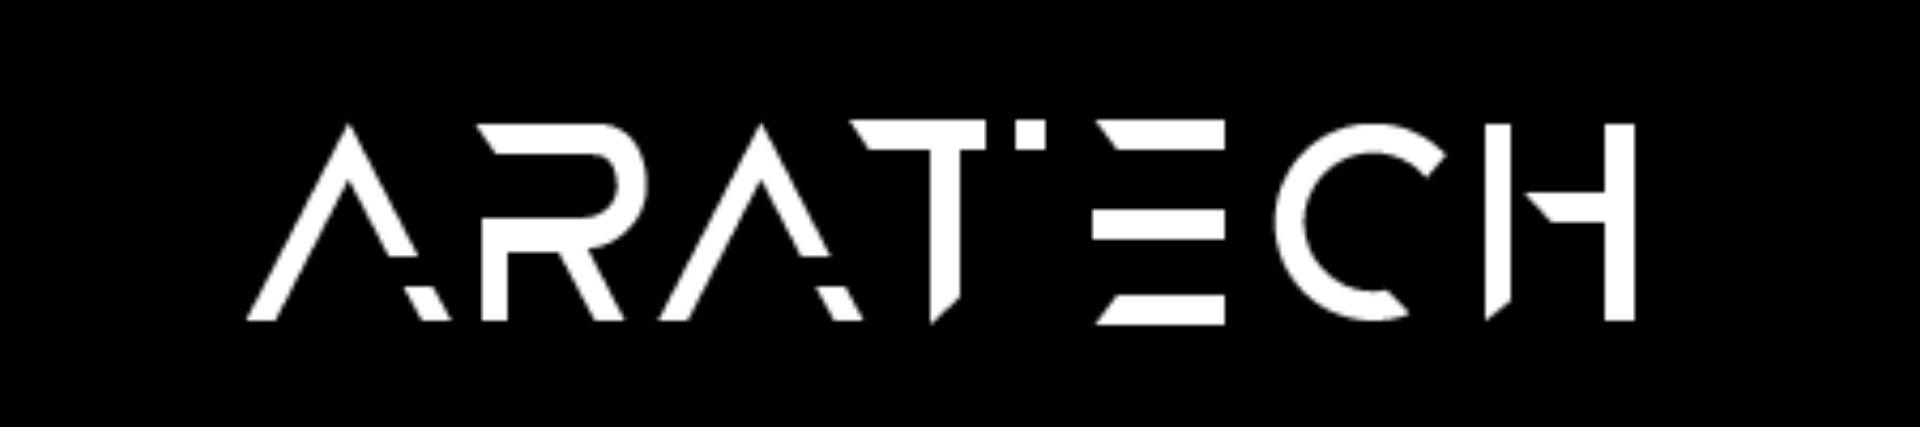 Aratech logo